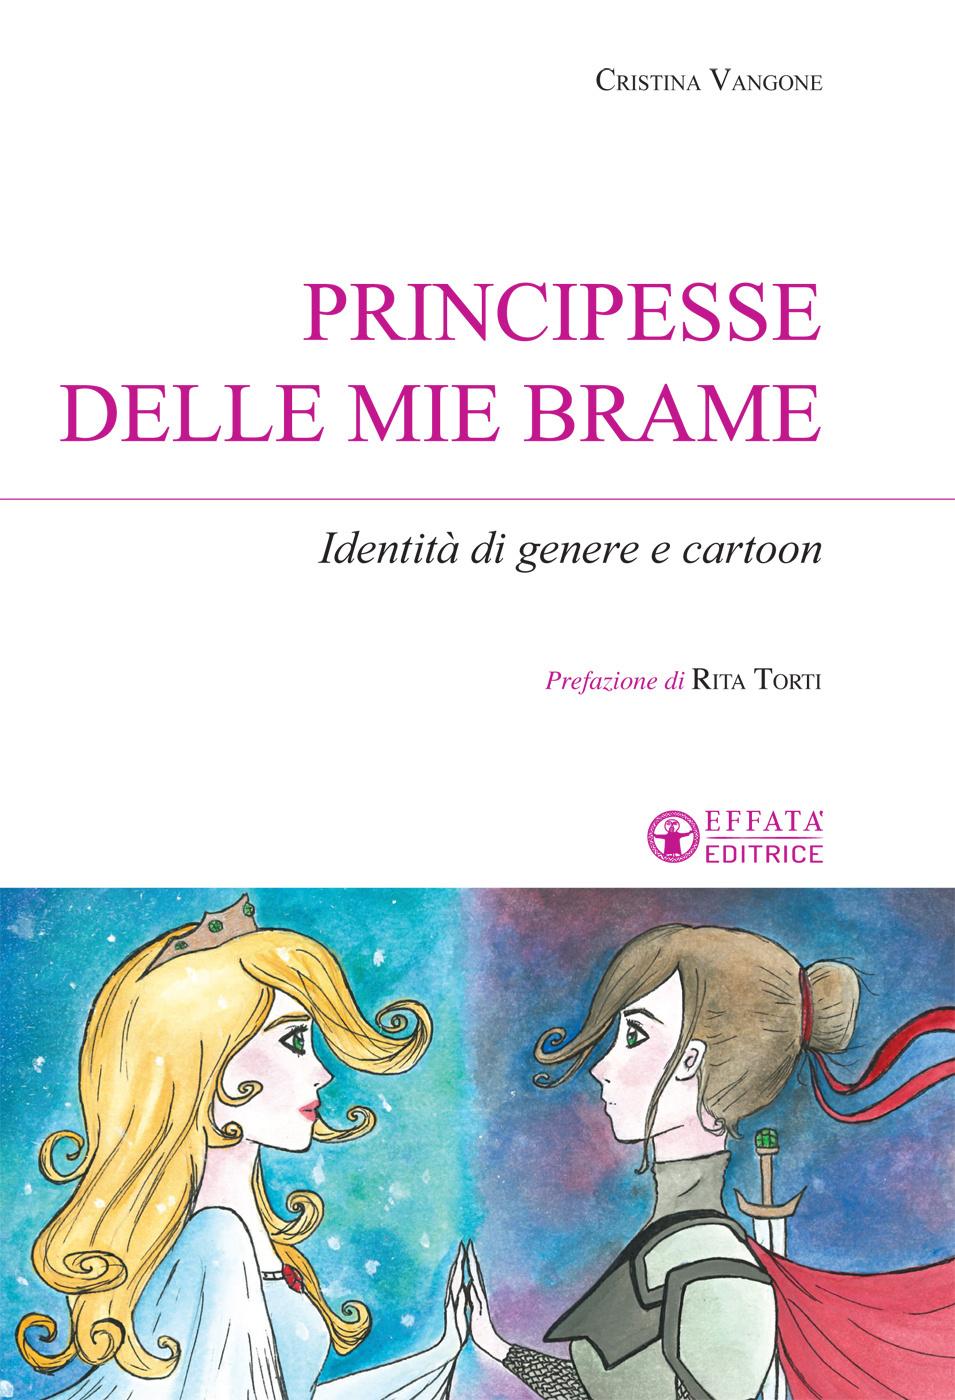 Disney Principesse sesso cartoni animati